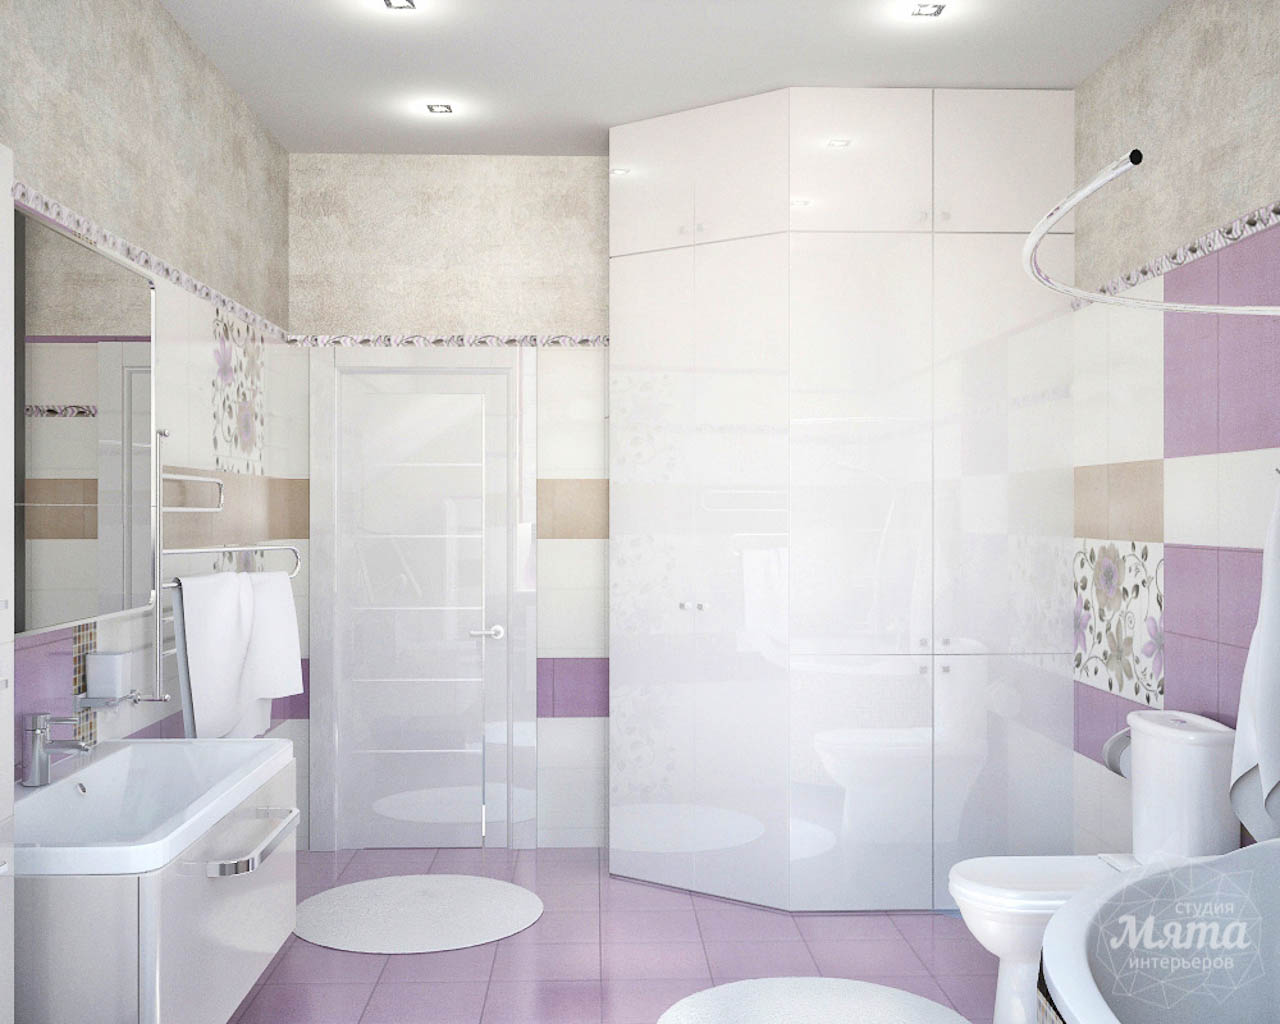 Дизайн интерьера и ремонт трехкомнатной квартиры по ул. Чкалова 124 img11090980